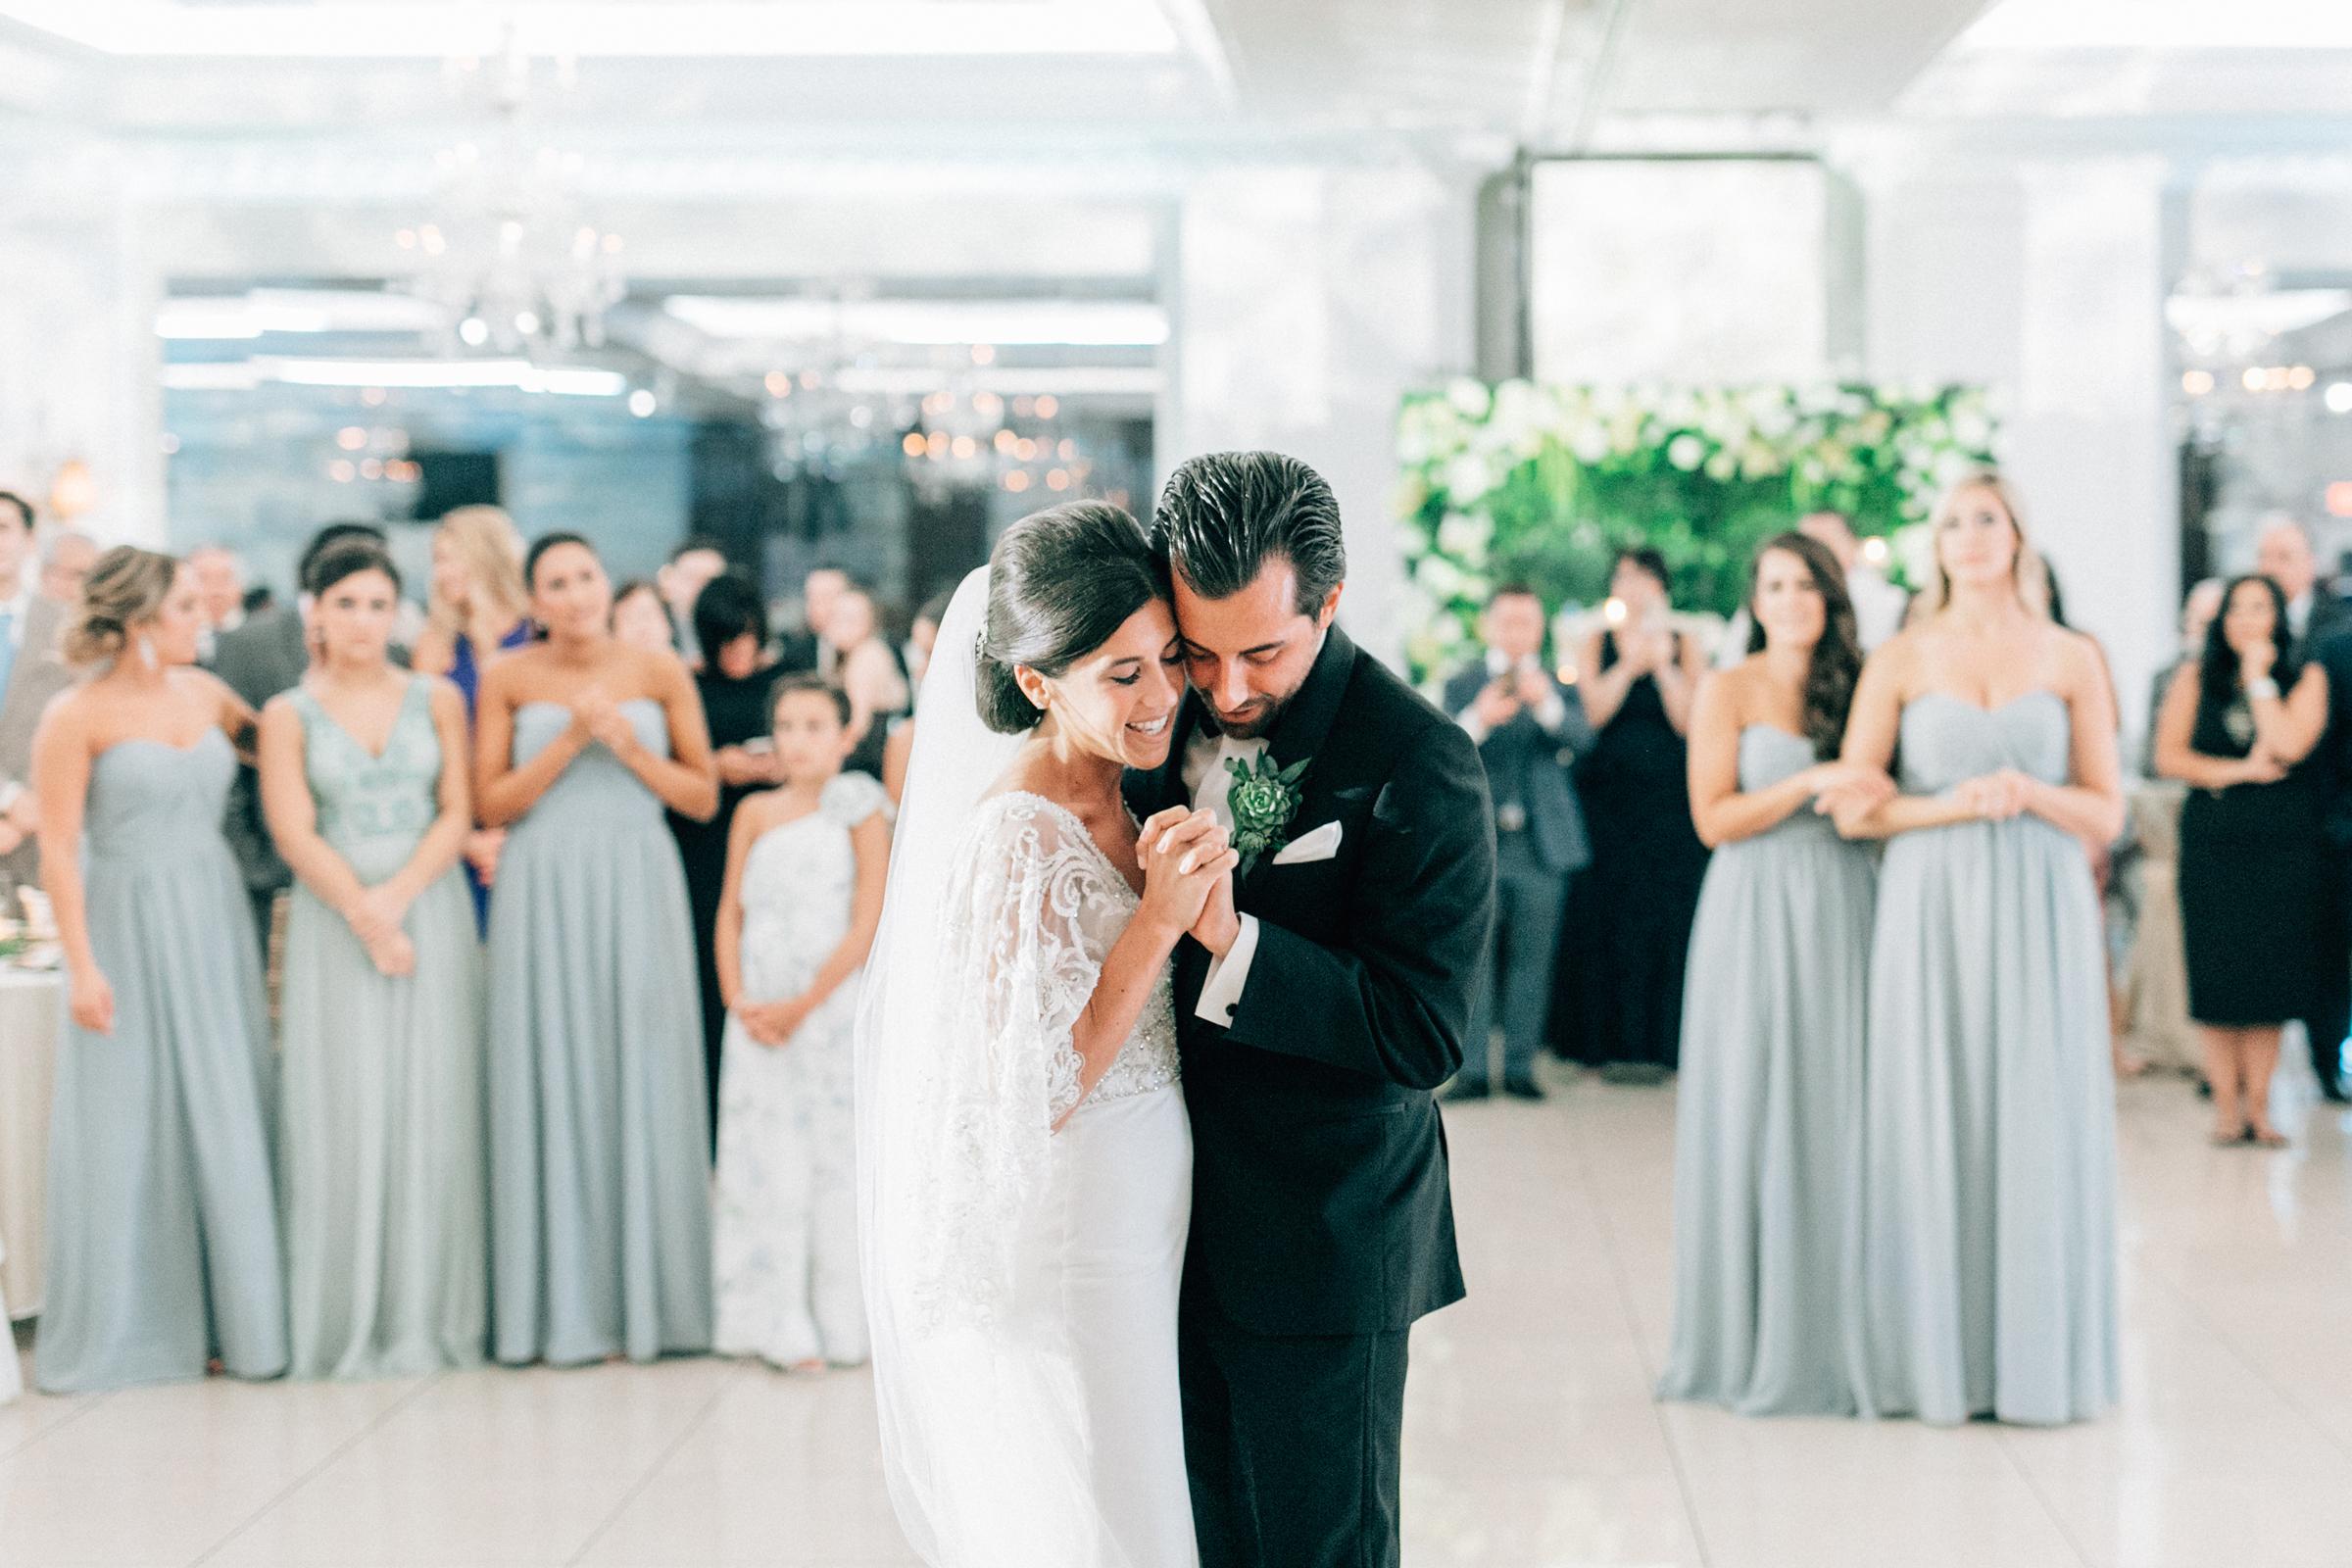 Elegant New Jersey Wedding with Greenery 90